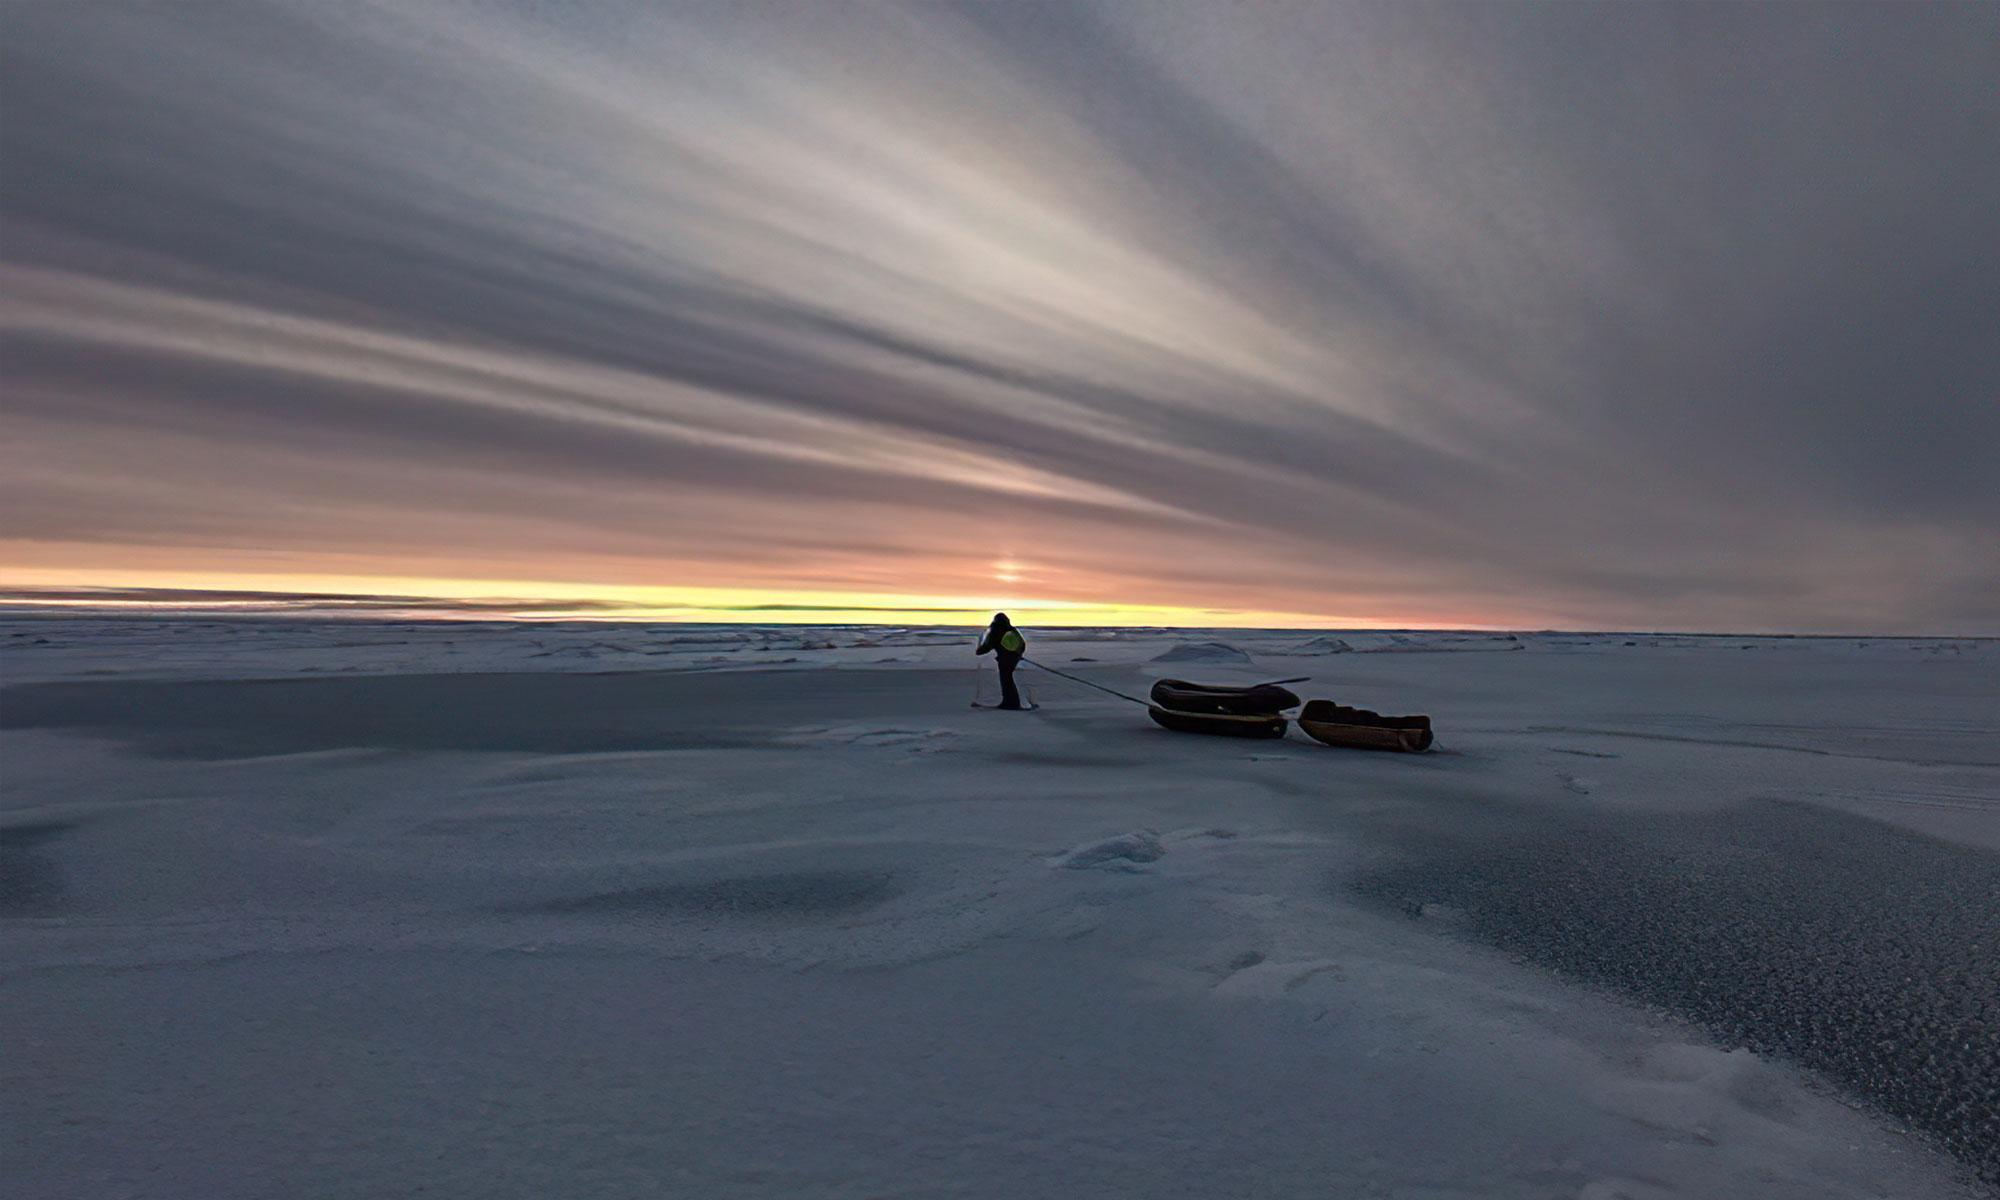 Bjorg Ousland - Pole to Pole (Mike Horn)